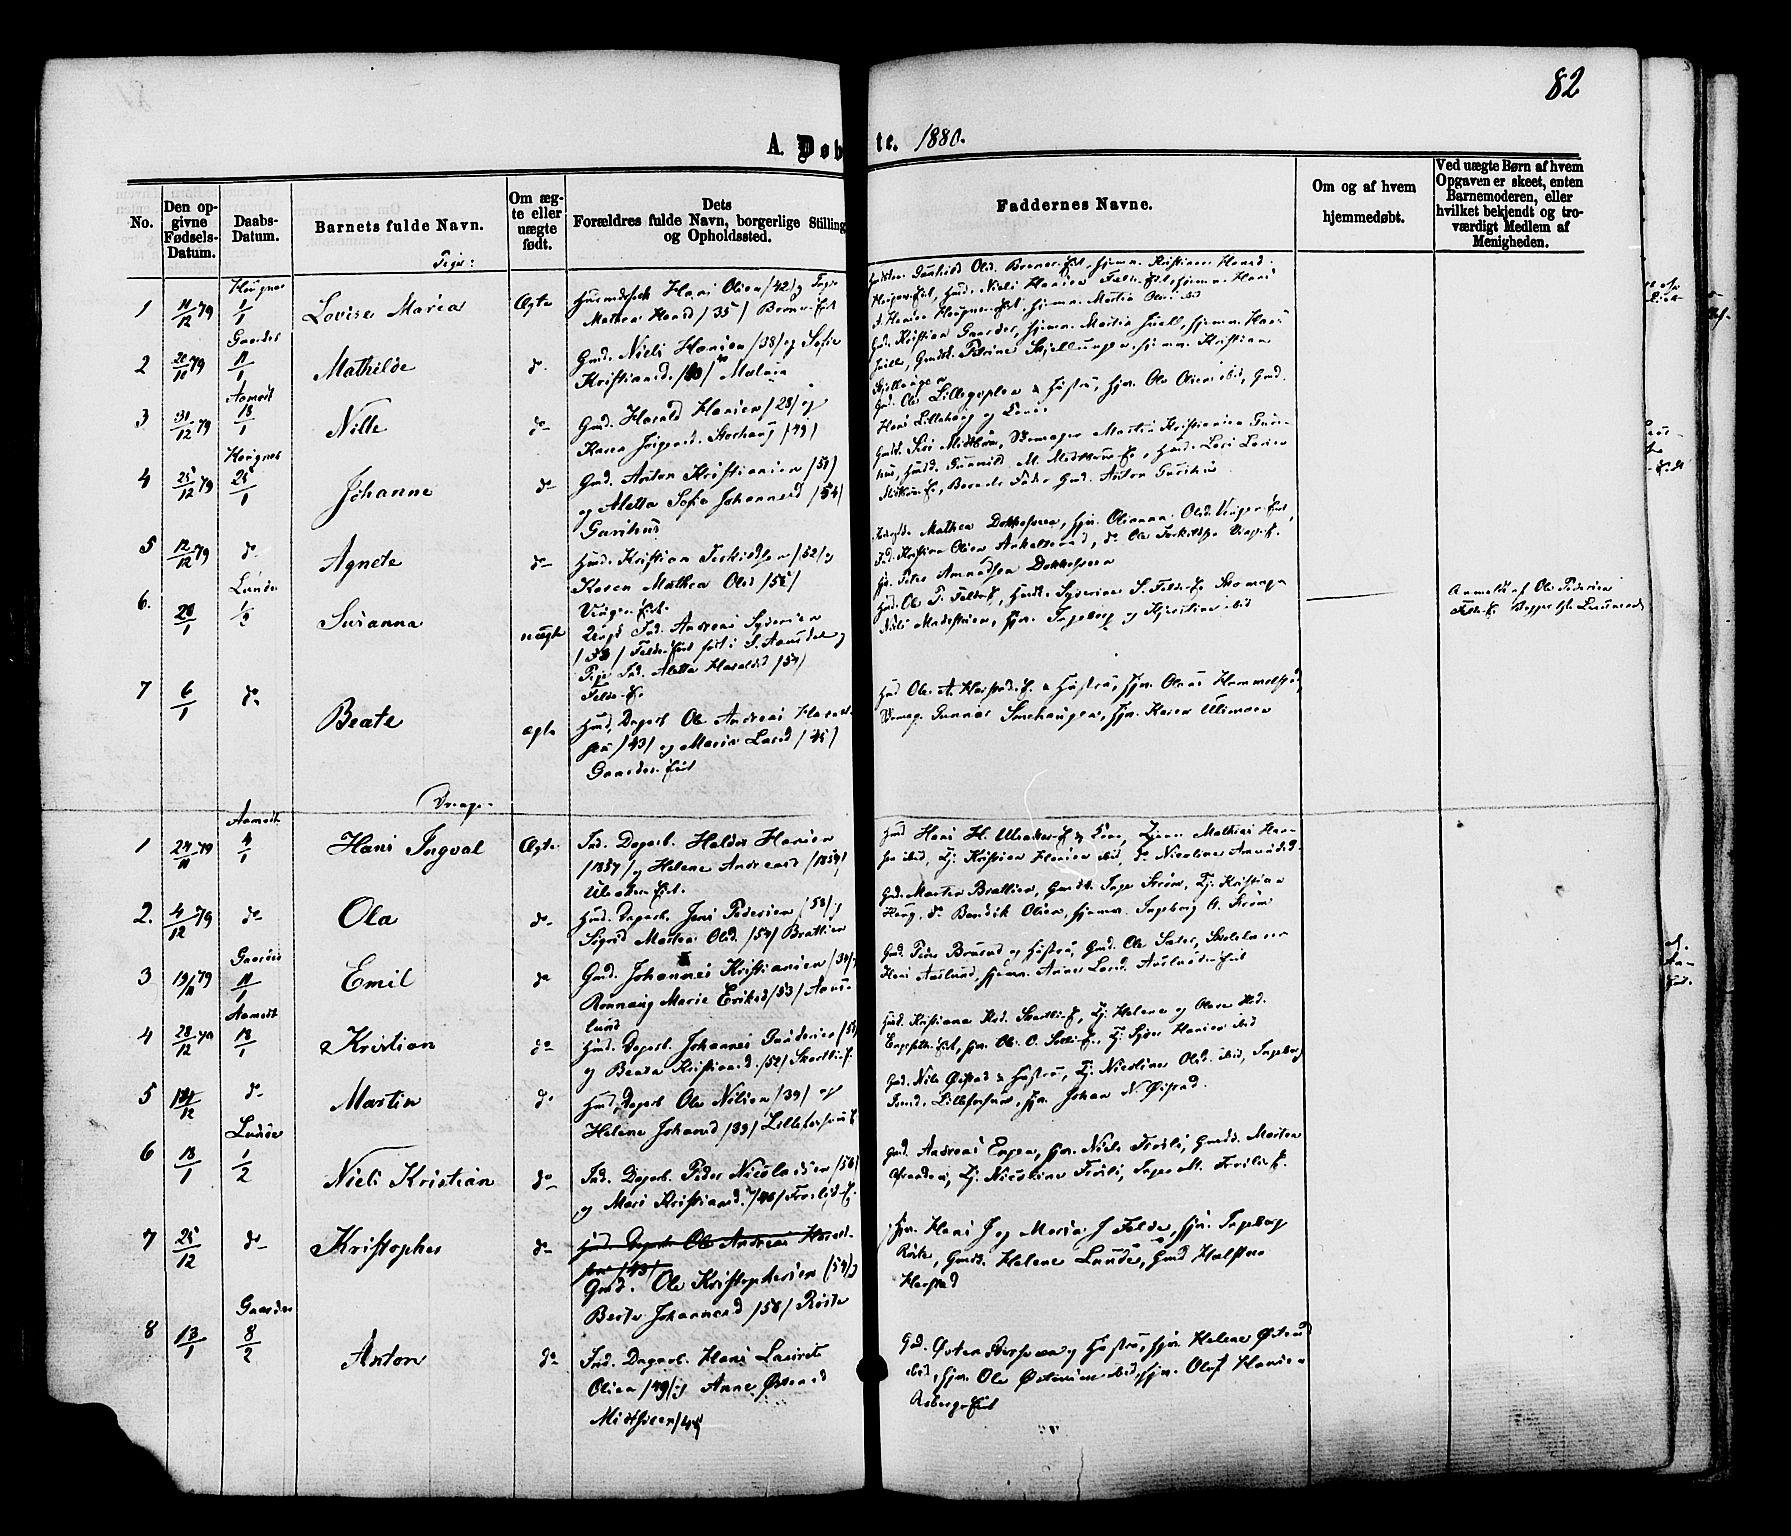 SAH, Nordre Land prestekontor, Ministerialbok nr. 2, 1872-1881, s. 82